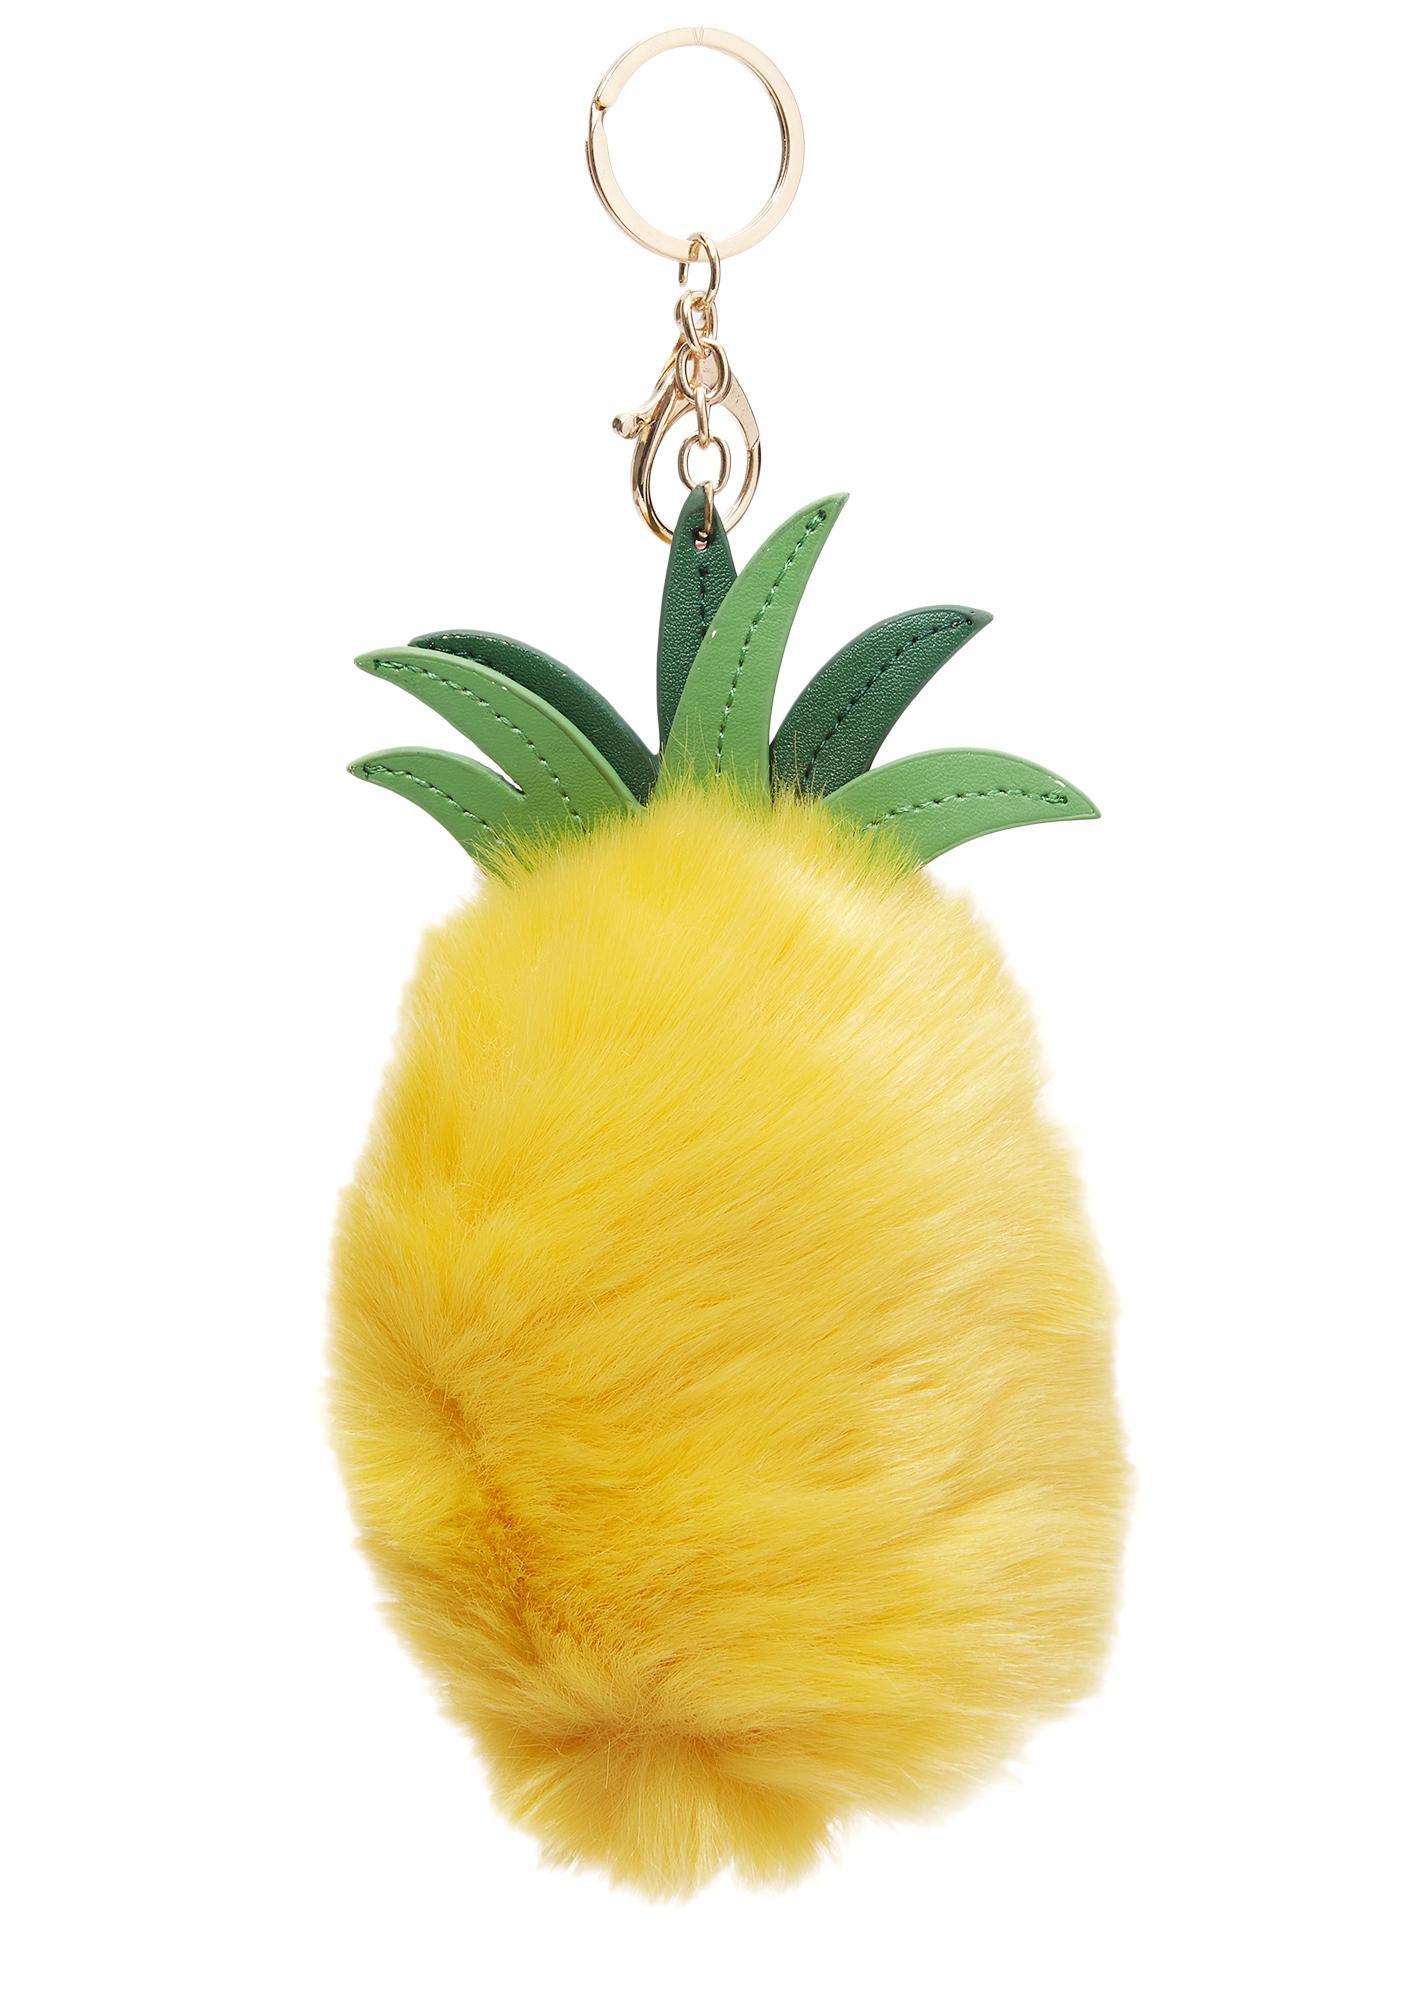 Furry Pineapple Keychain